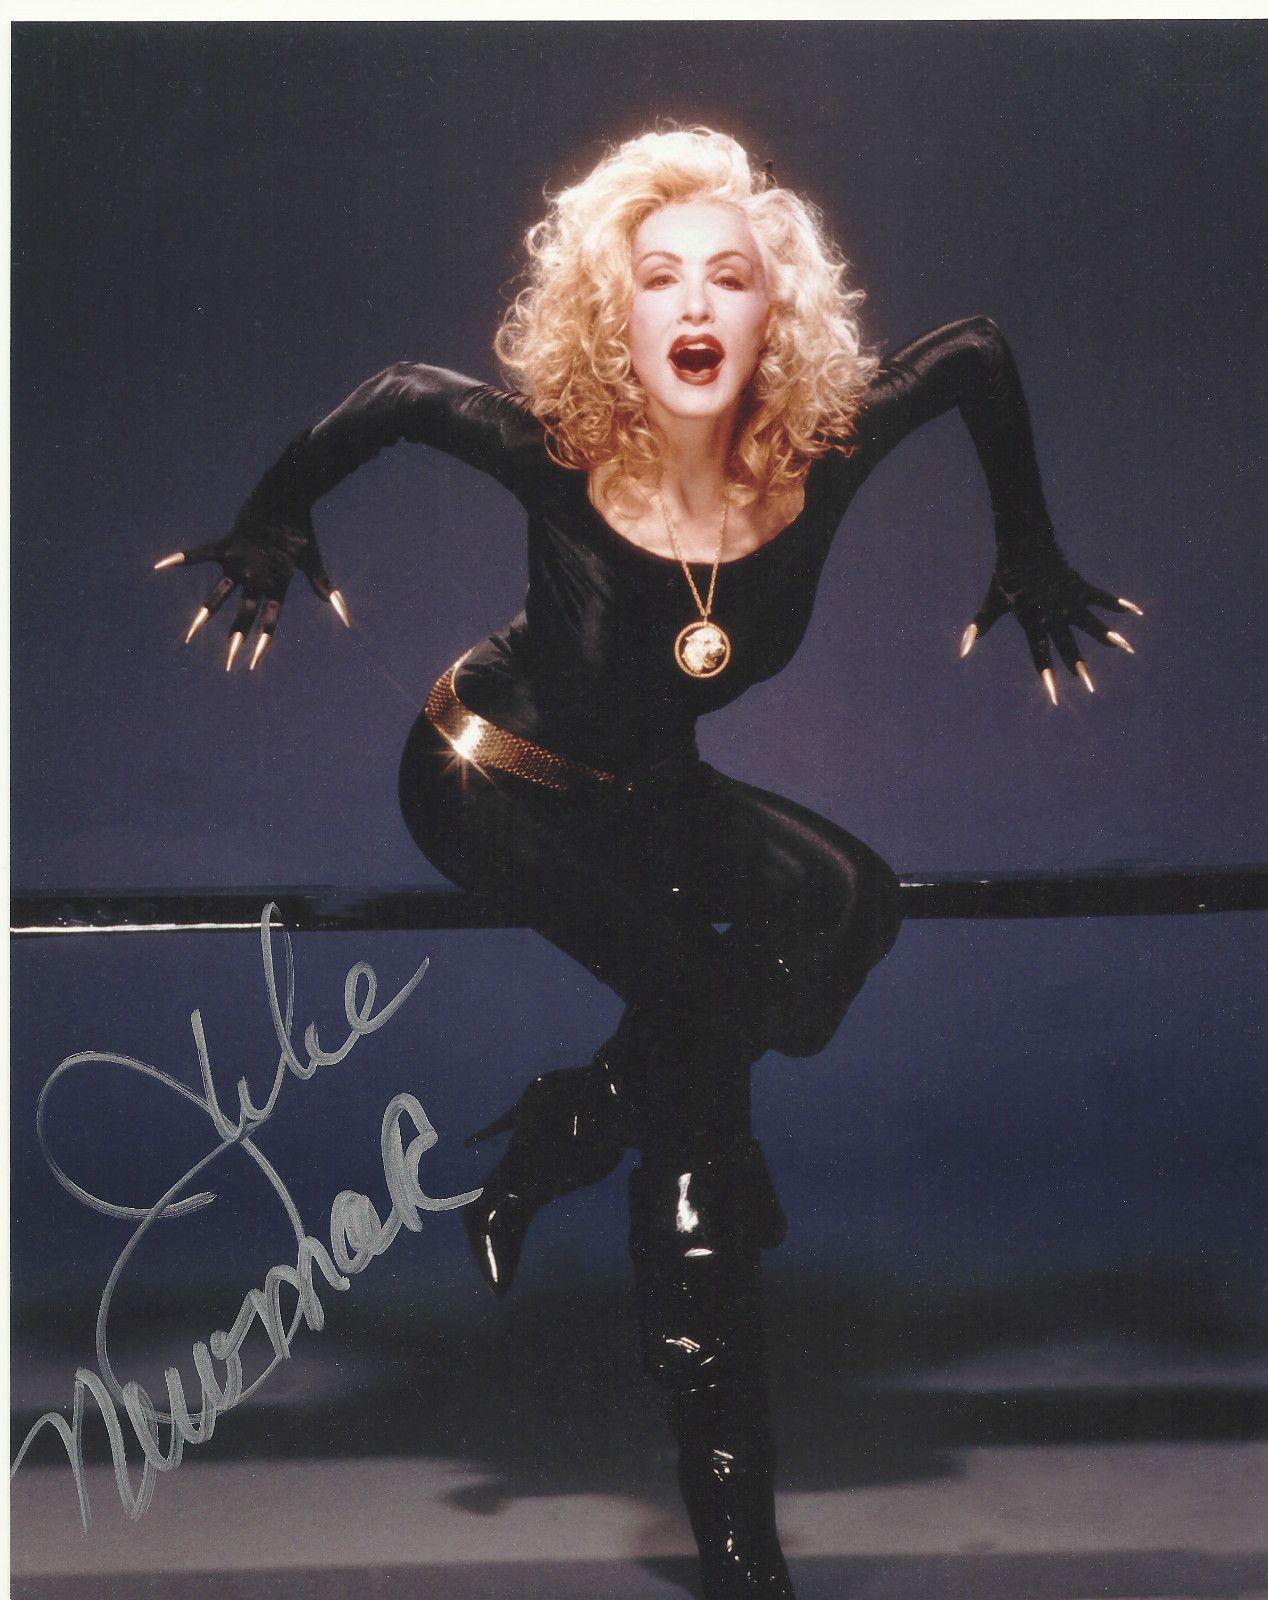 Signed bob mason picture 8x10 jsa view all bob mason - Julie Newmar Signed Autographed 8 X 10 Photo Photograph Catwoman Batman I 09 Ebay